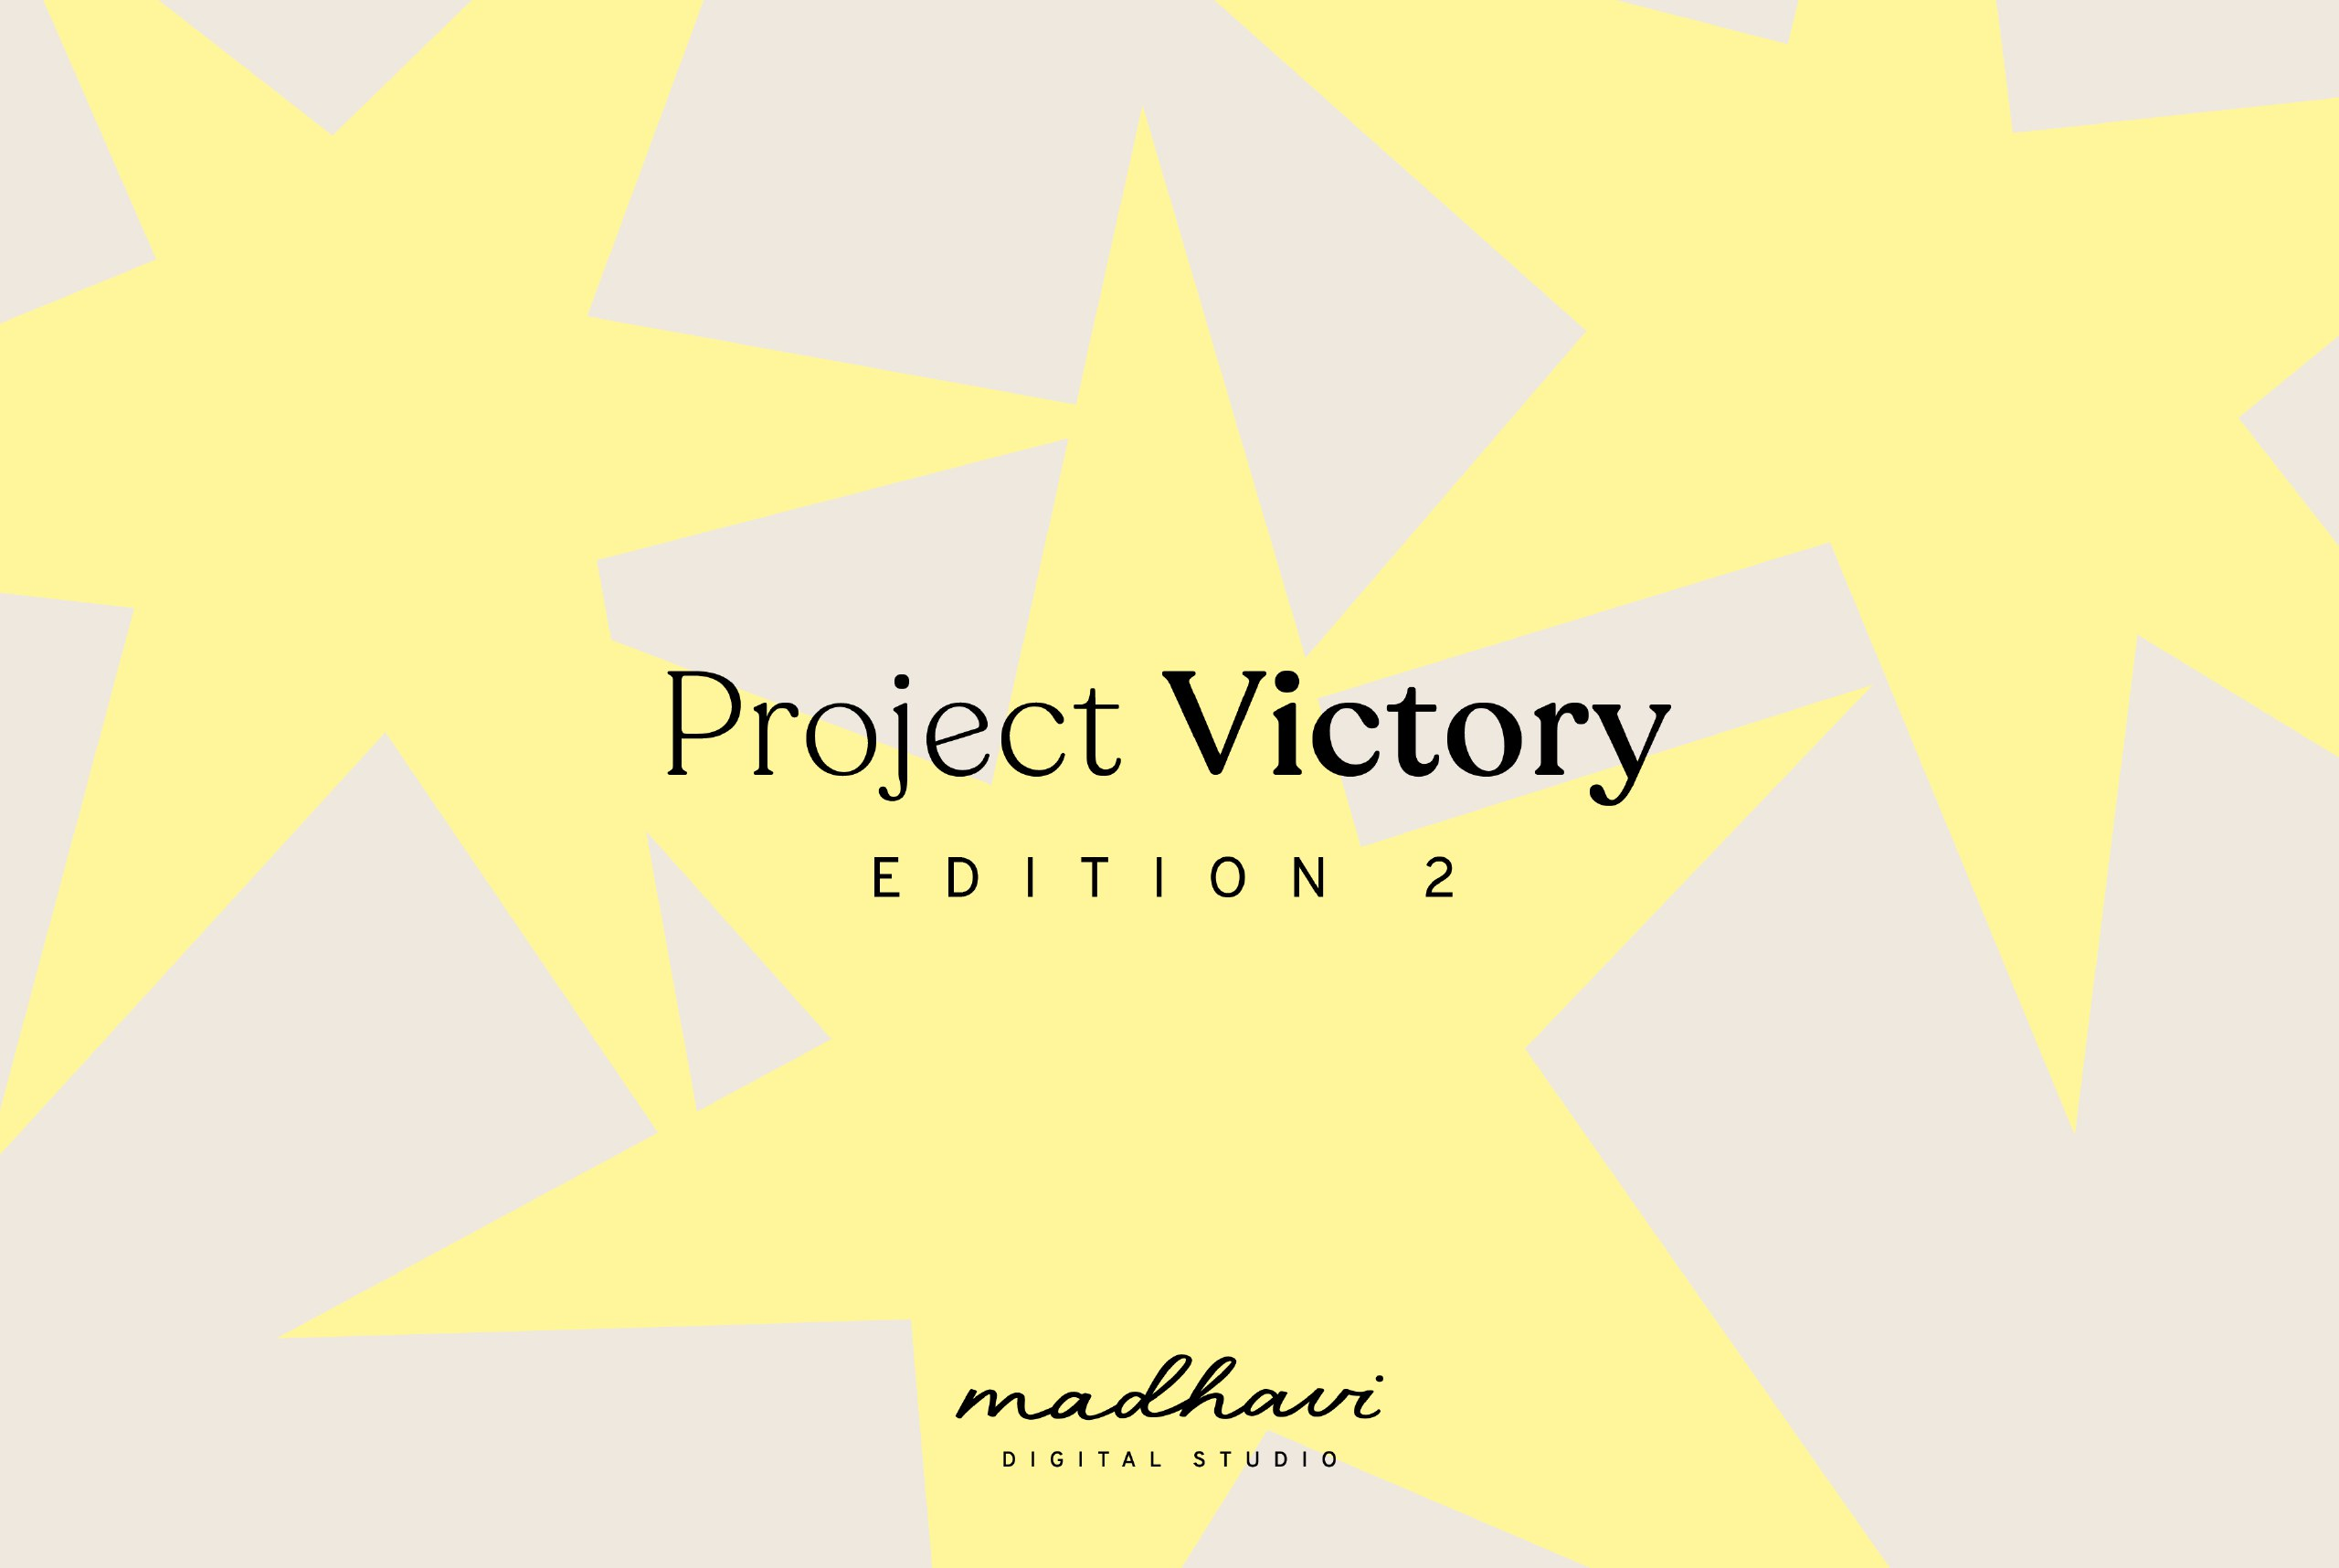 kundalini-yoga-project-victory-madhavi-guemoes